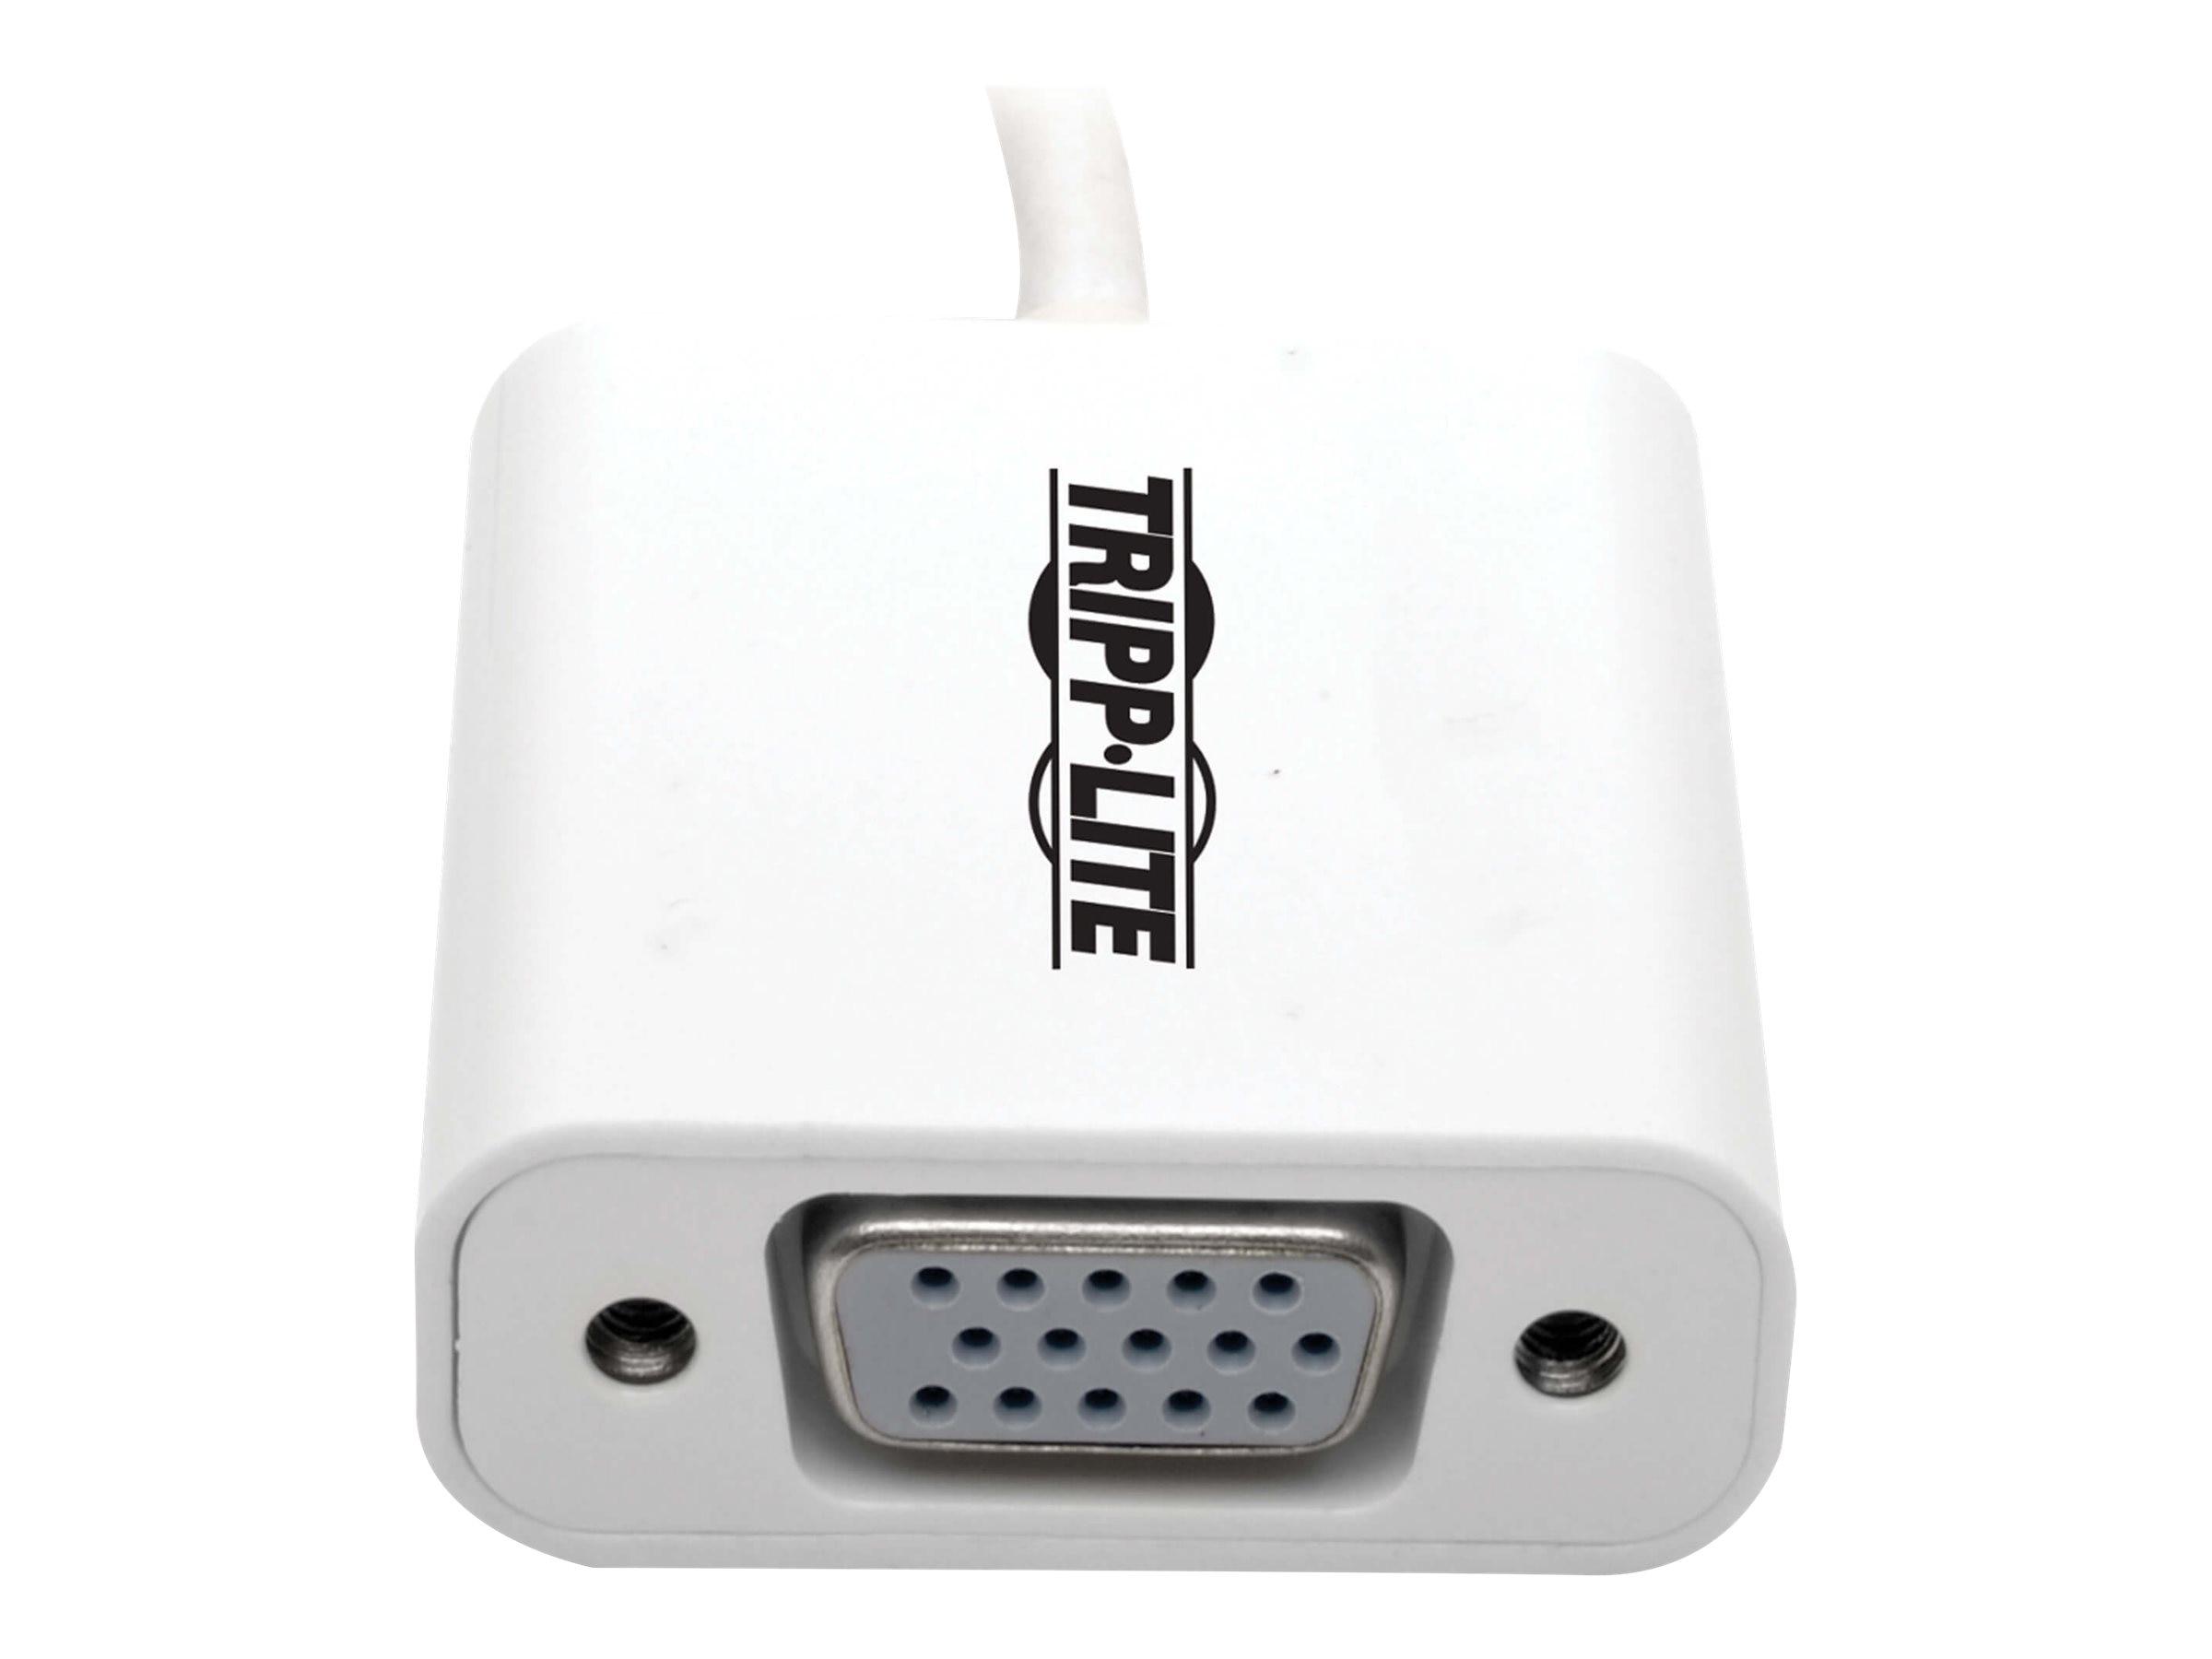 Tripp Lite USB 3 1 Gen 1 Type C to HDDB15 VGA M F Displayport Alt Mode  1080p Video Adapter Converter, White